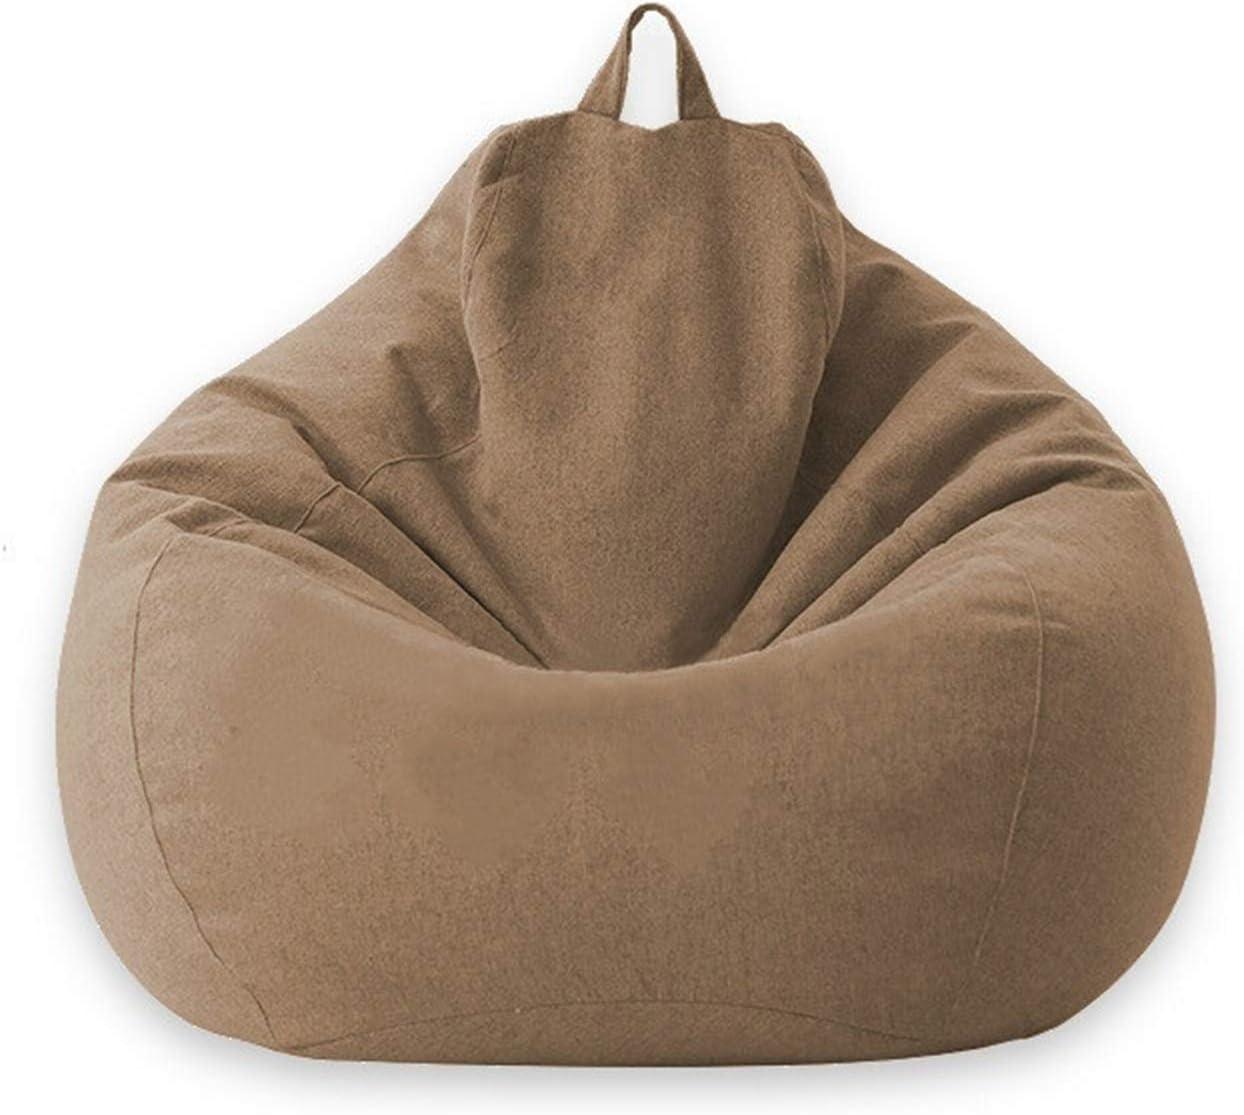 DSLE High-end Bean Bag Chair Fashion Sofa San Diego Mall Kansas City Mall Cover Multicolor Lazy